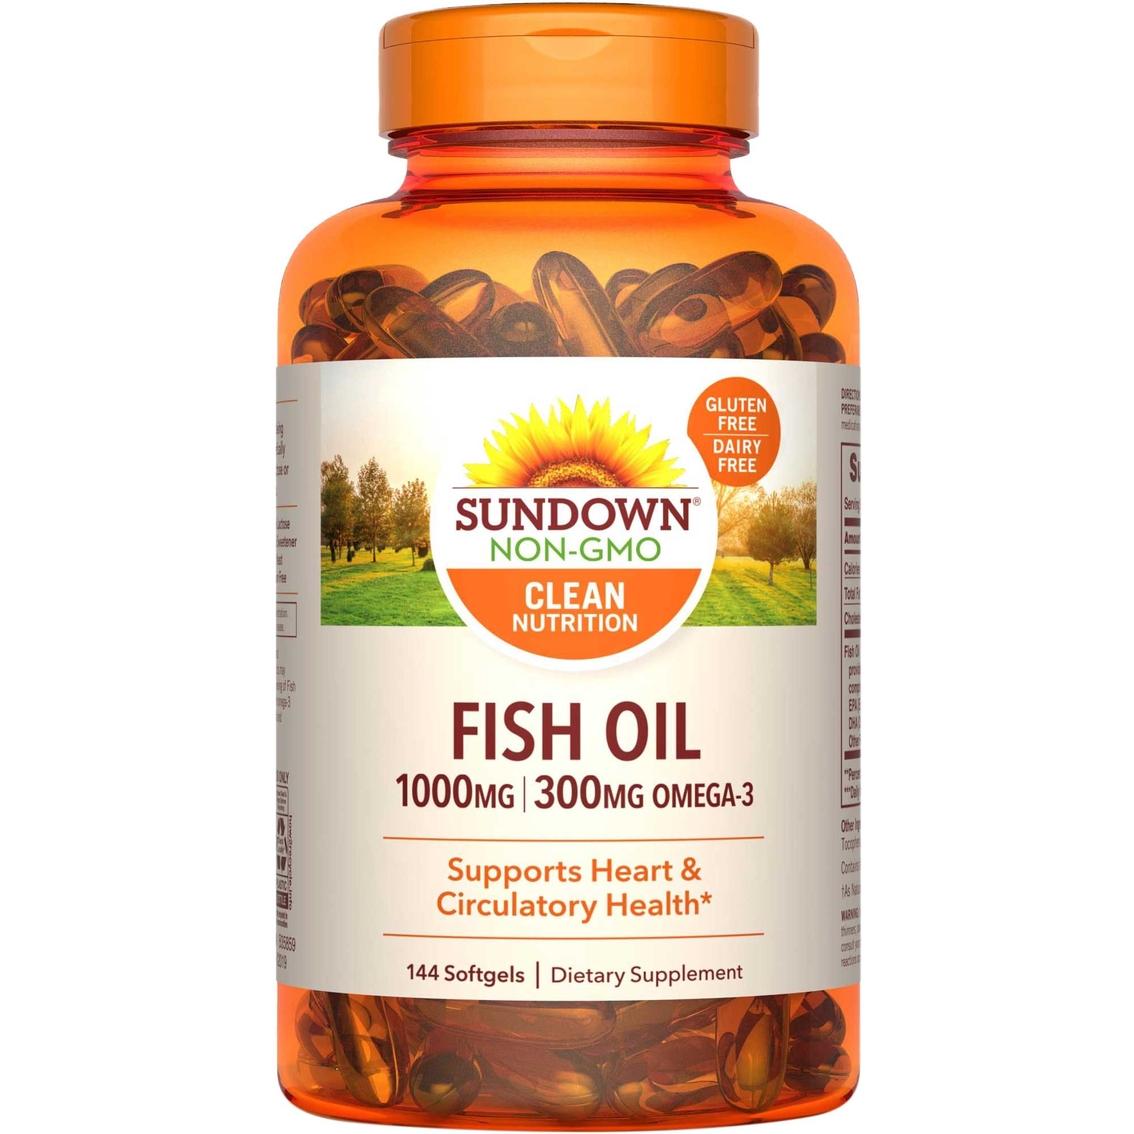 Sundown naturals fish oil 180 120 1000 mg softgels 144 pk for Fish oil 1000 mg